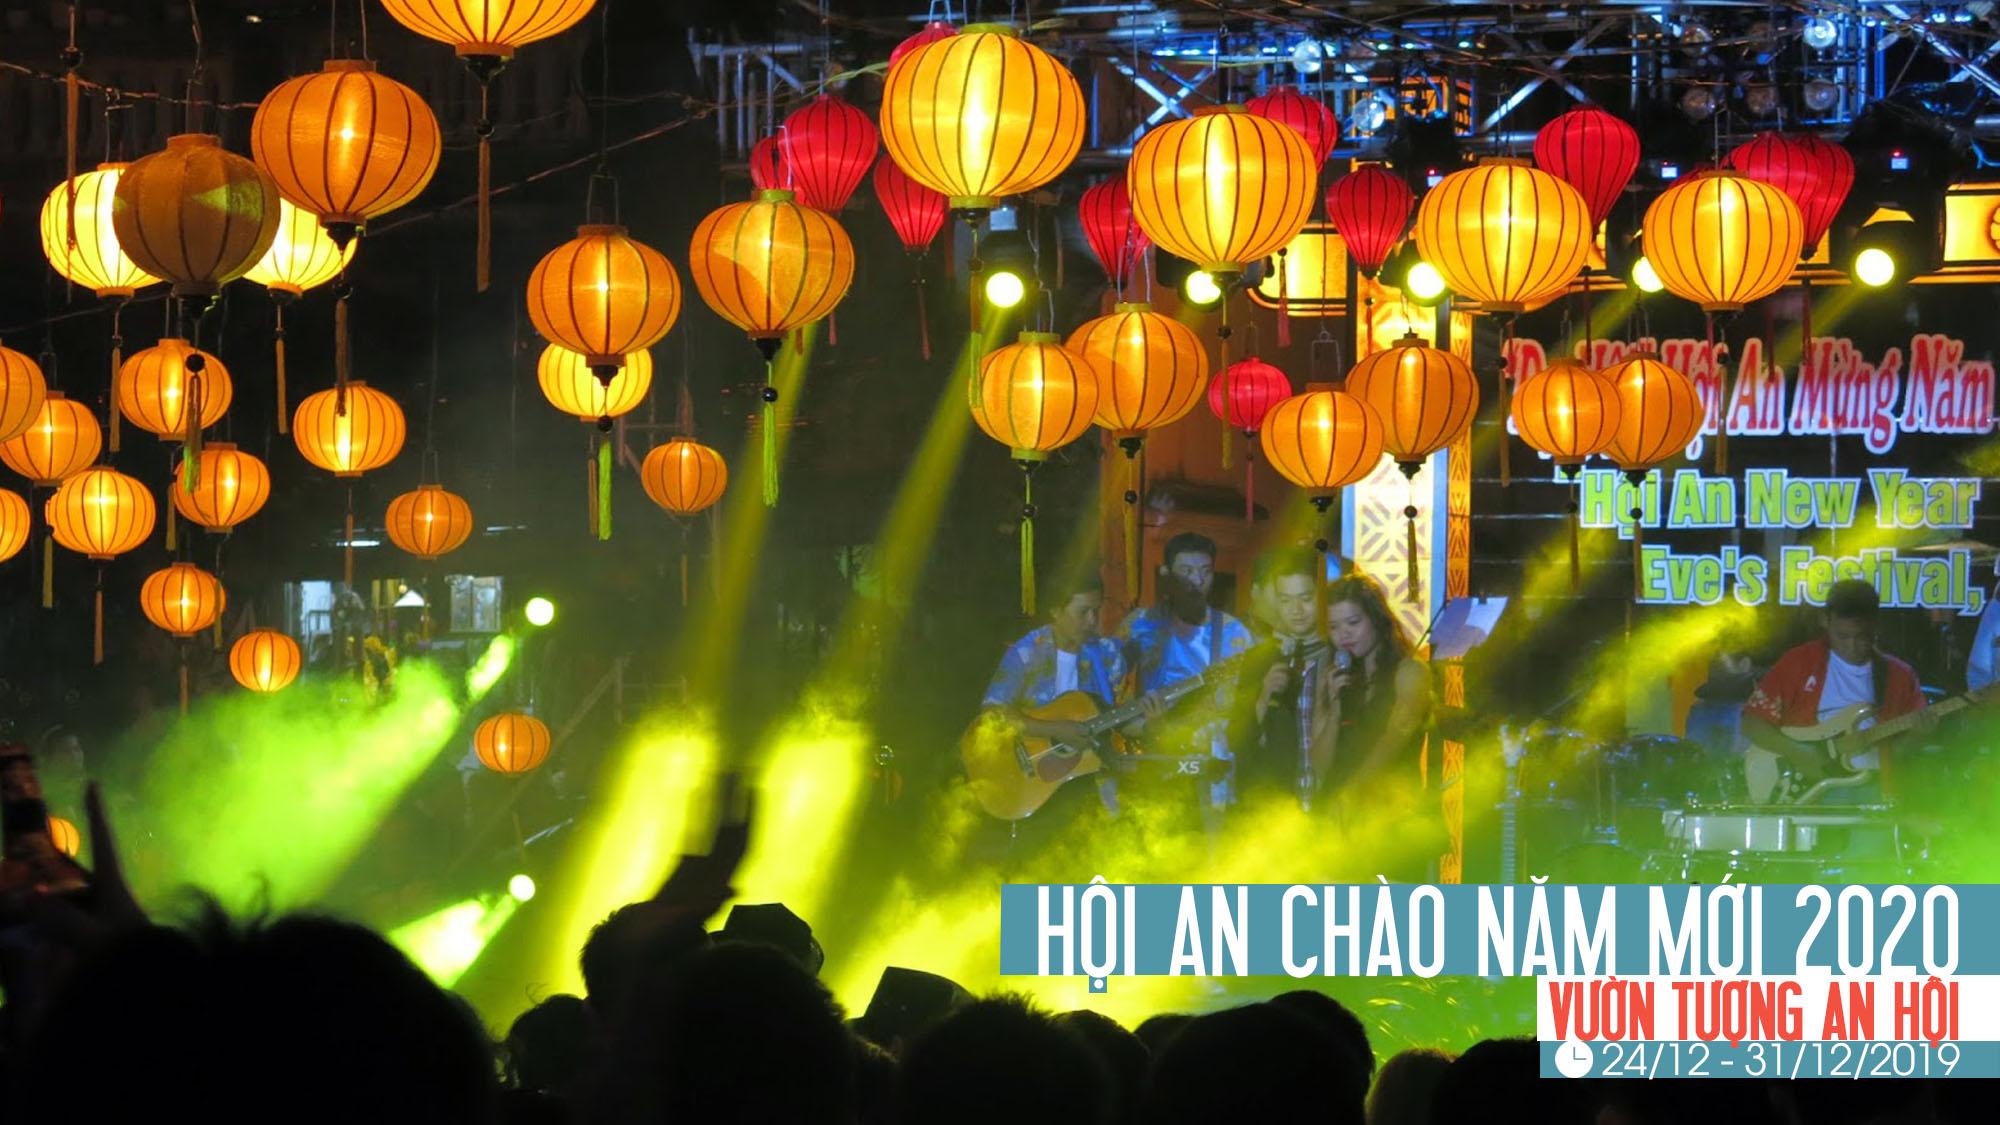 Hoi An Chao Nam Moi 2020